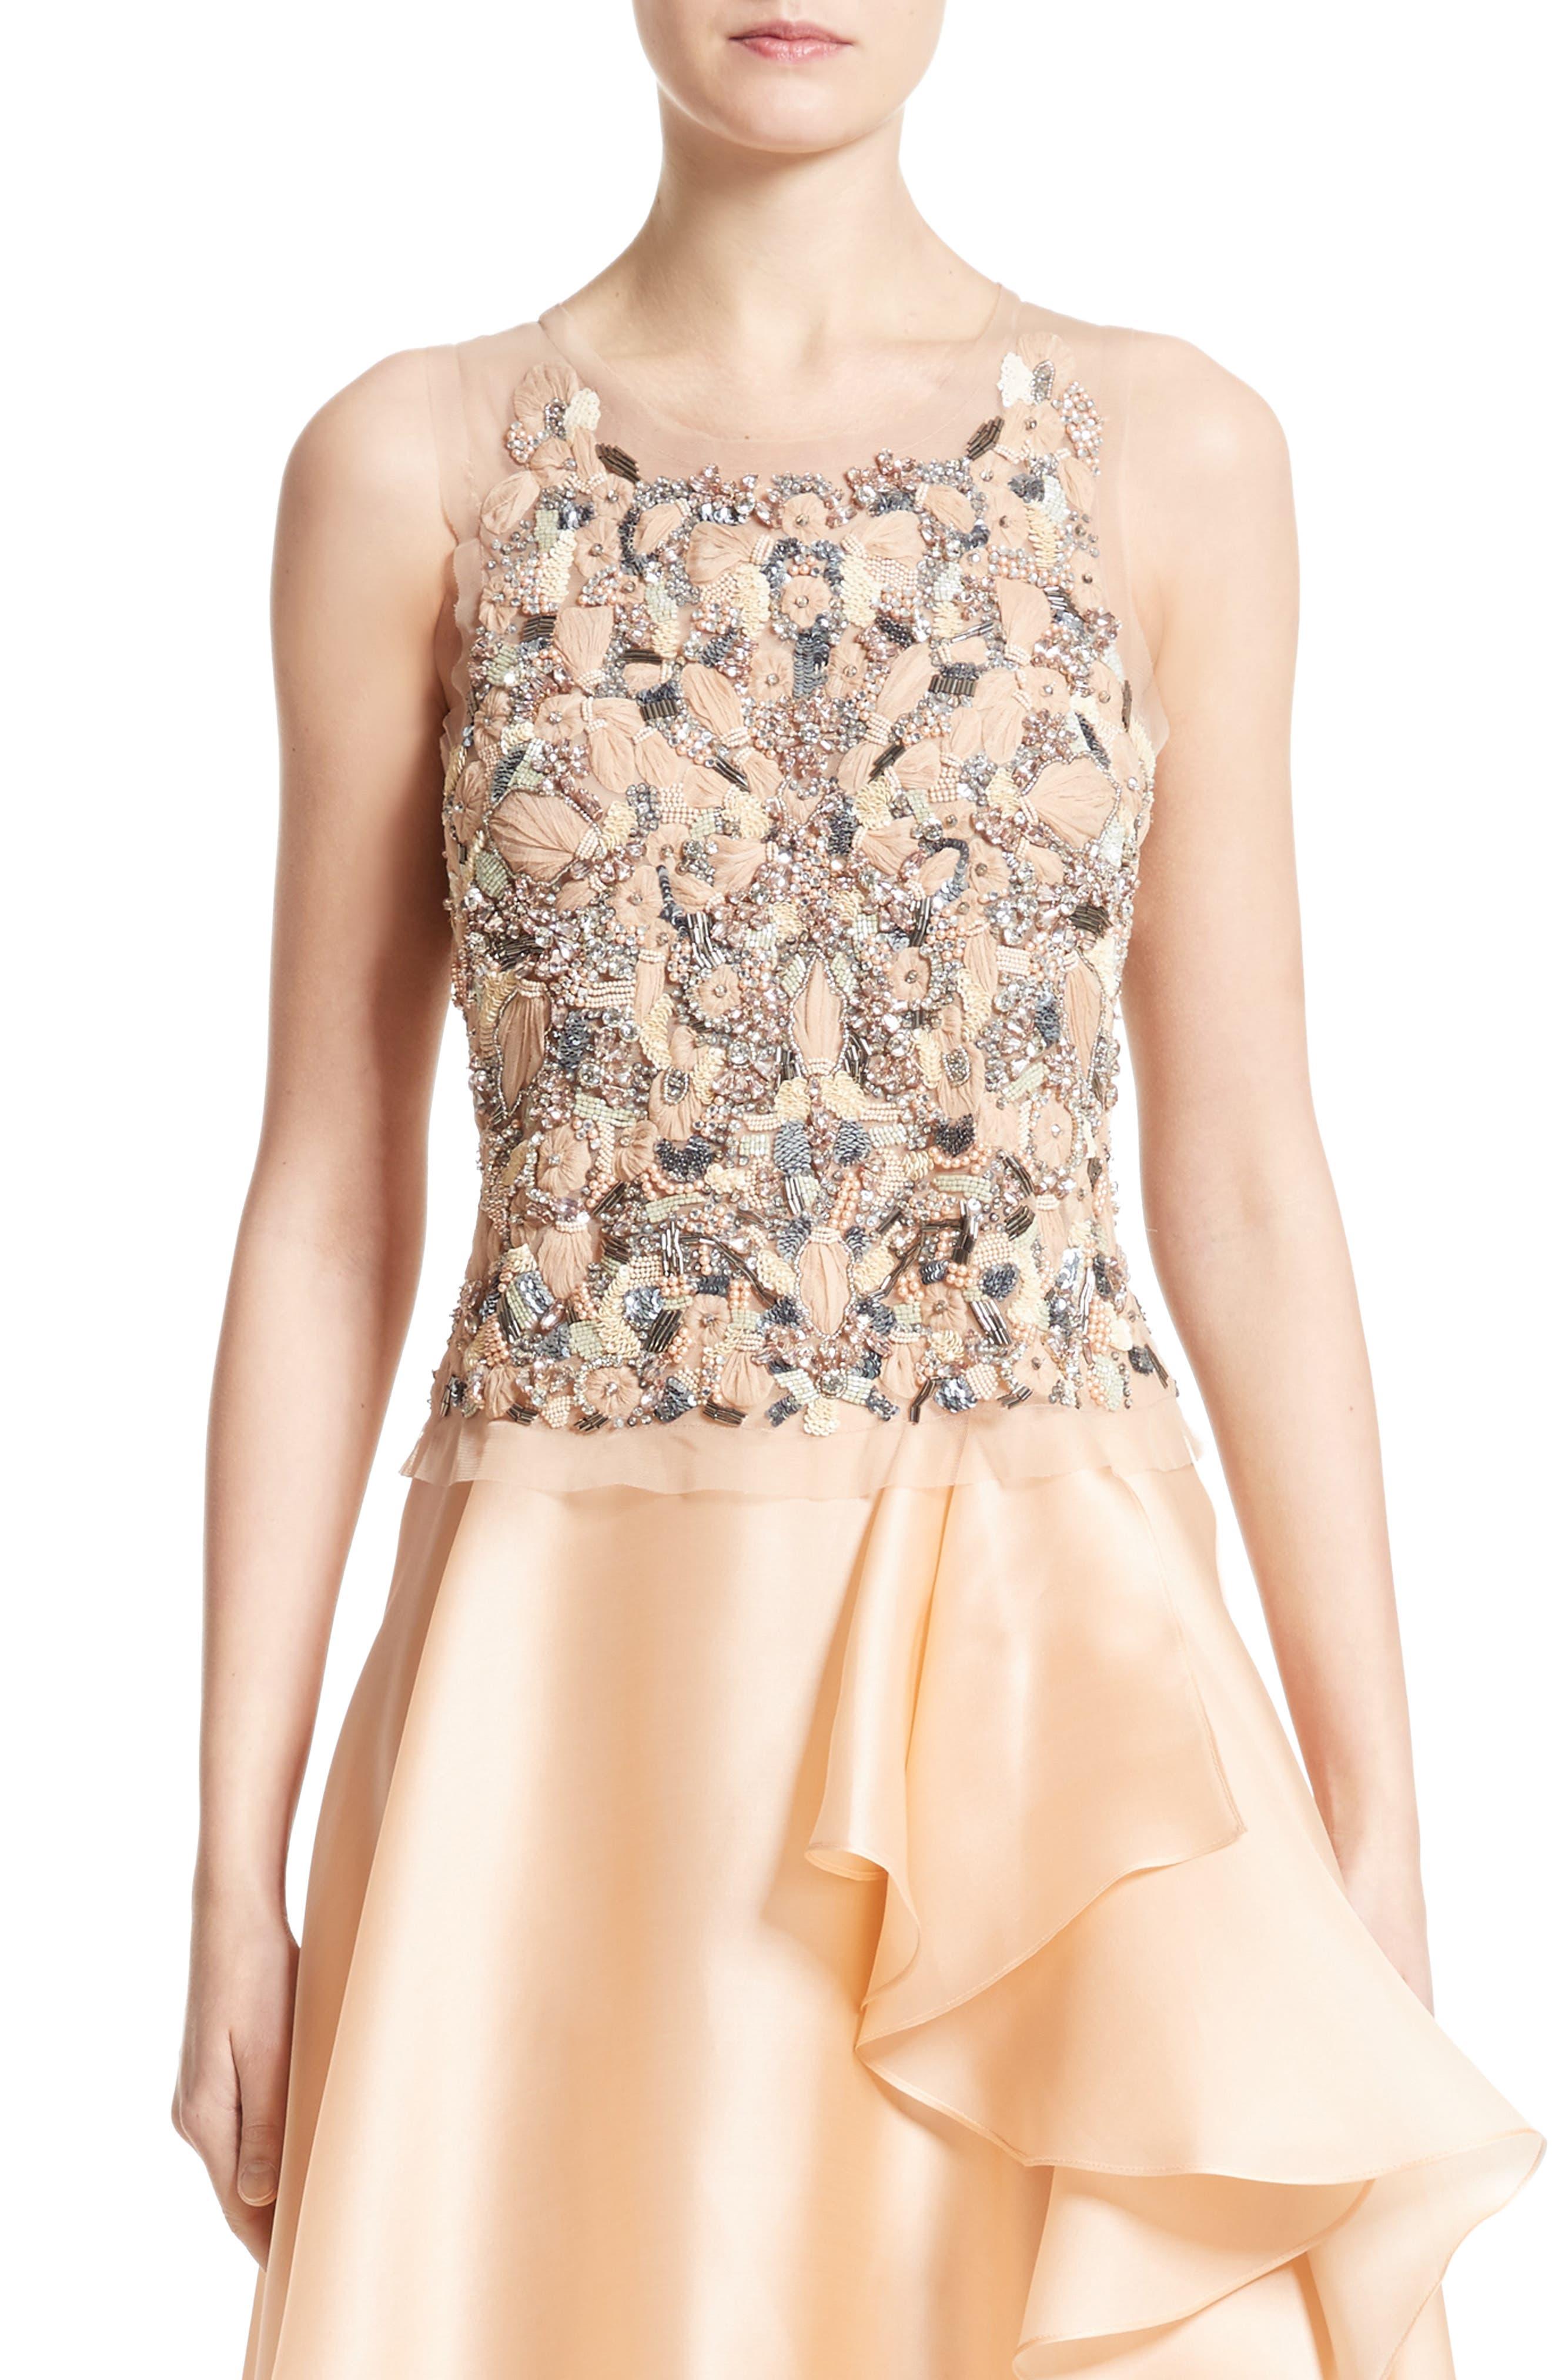 Badgley Mischka Couture Beaded Top,                             Main thumbnail 1, color,                             681